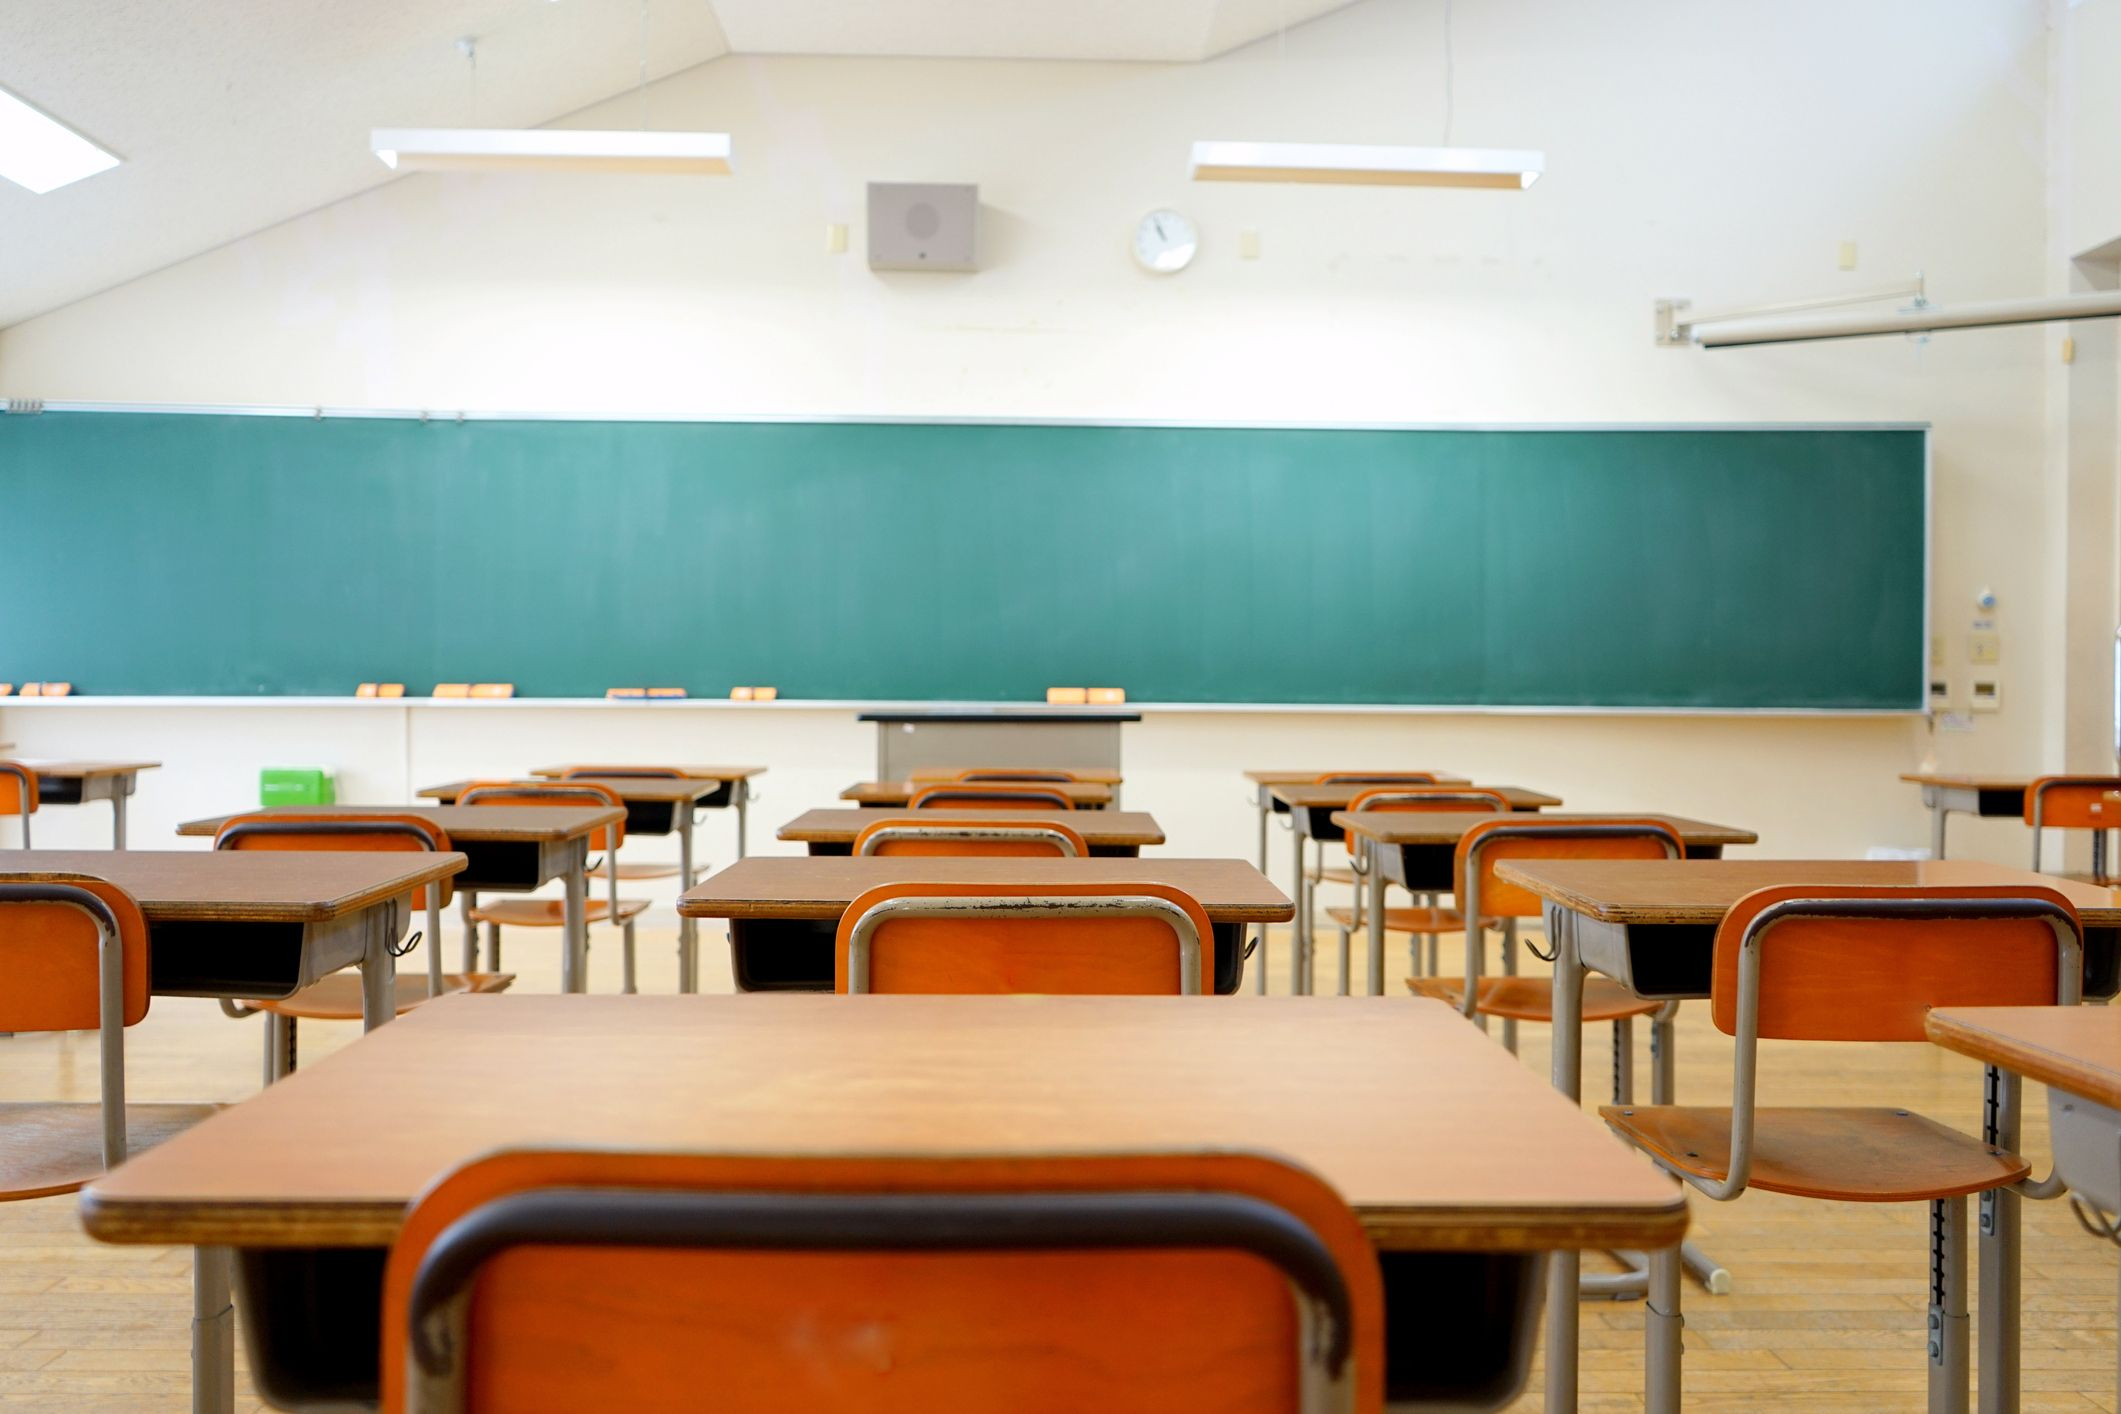 School Classroom In Japanese High School The Block Public